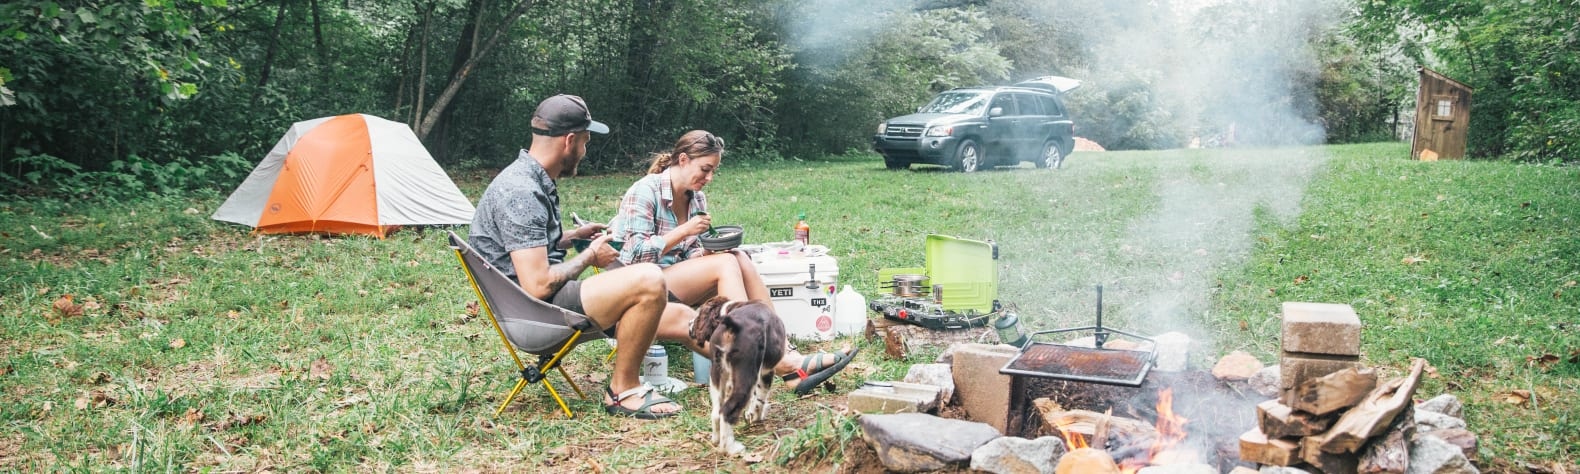 Hatch Camp and Art Farm